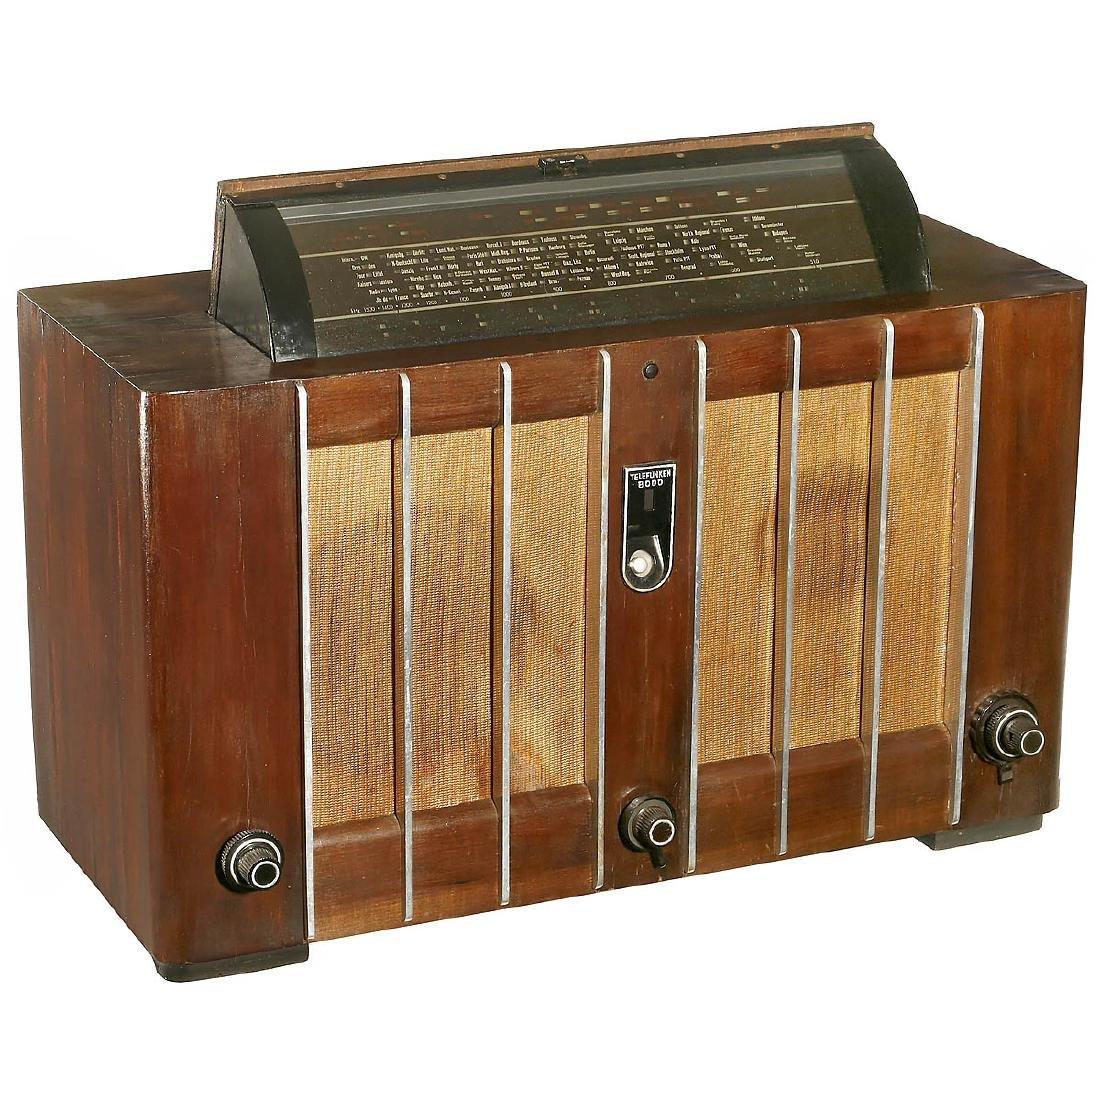 Telefunken-Spitzen-Super 8000 GWK Radio, 1938